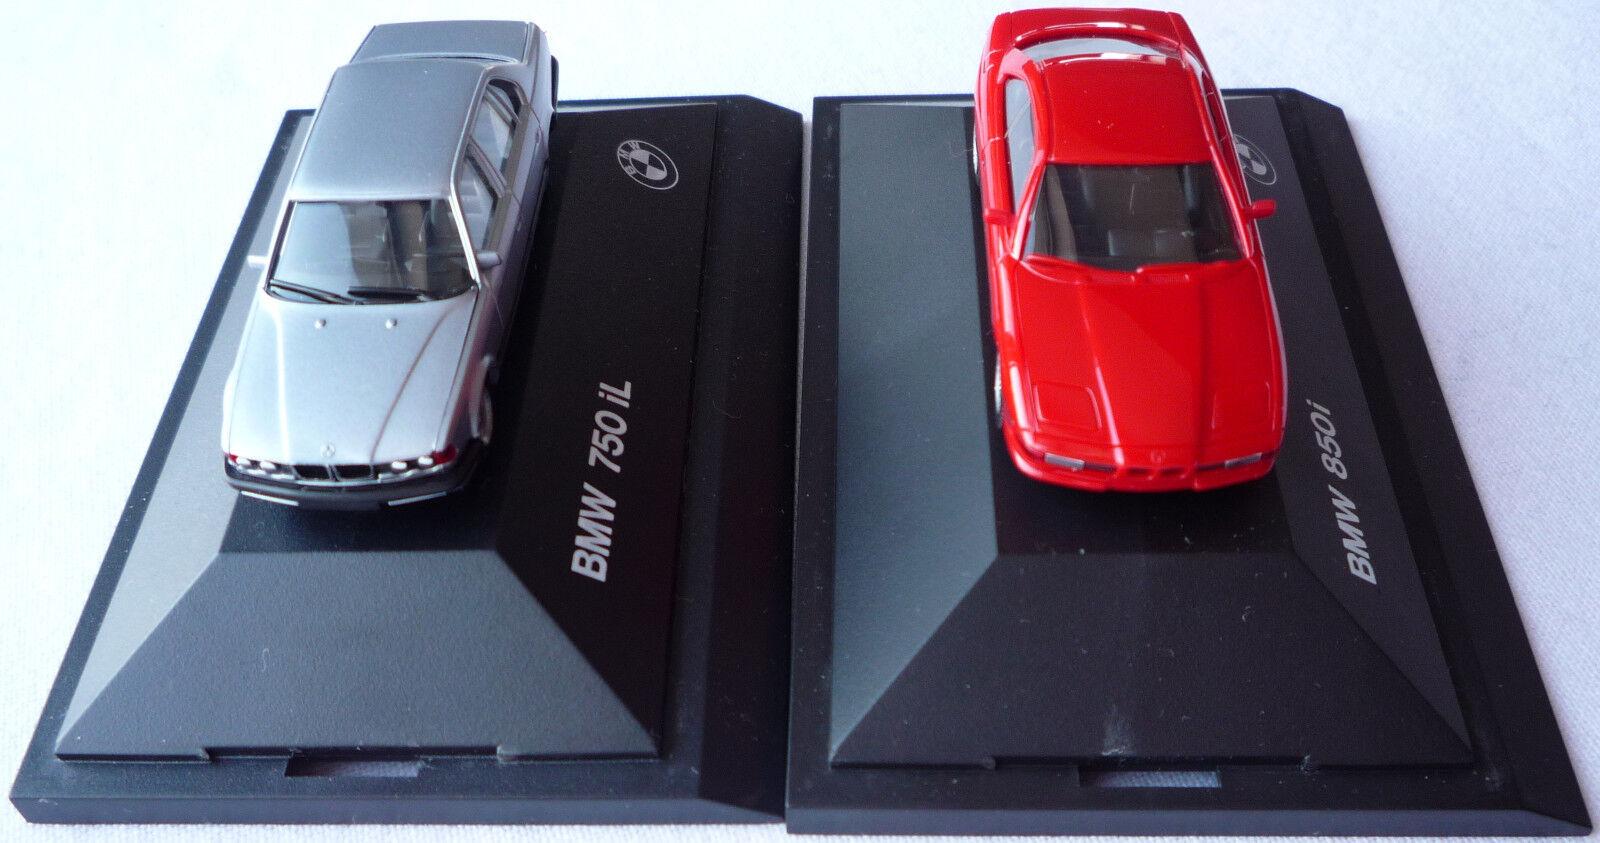 BMW E31 E31 E31 850I E32 750iL 7 8 Series 1602 327 Classic Car Model Postcard Set Gift cbd731